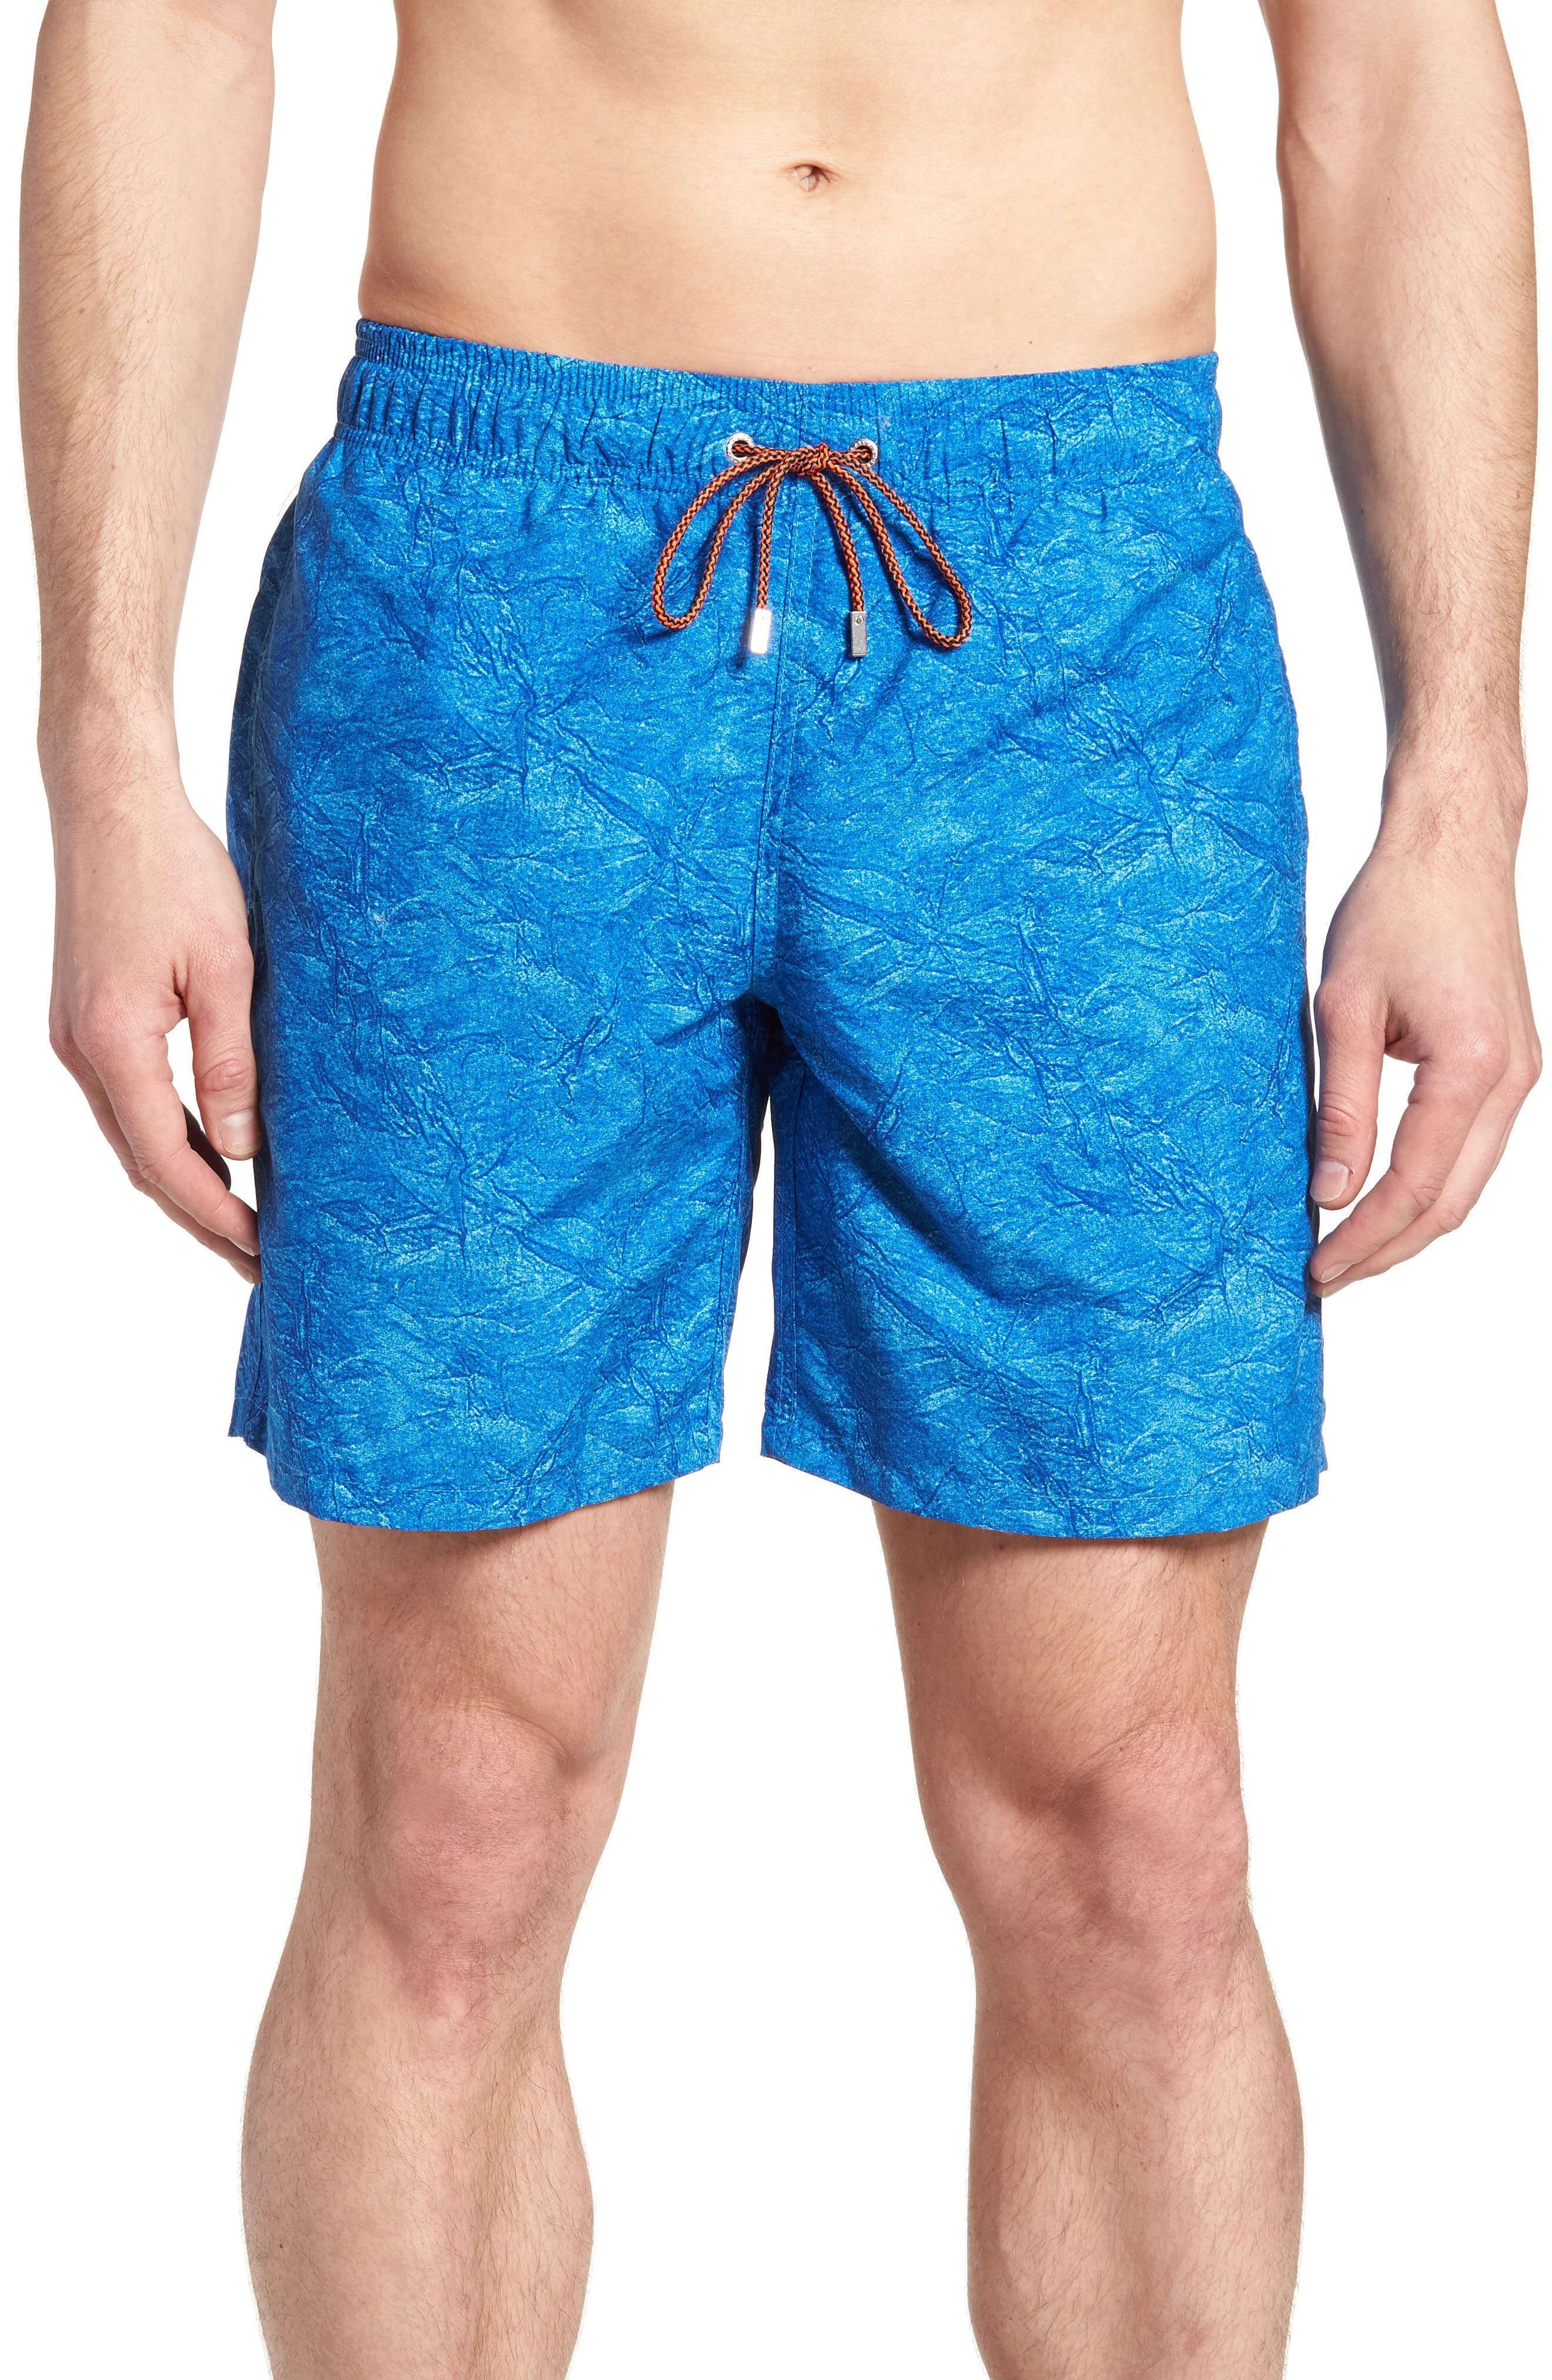 Marble Mood Swim Trunks,                         Main,                         color, 400